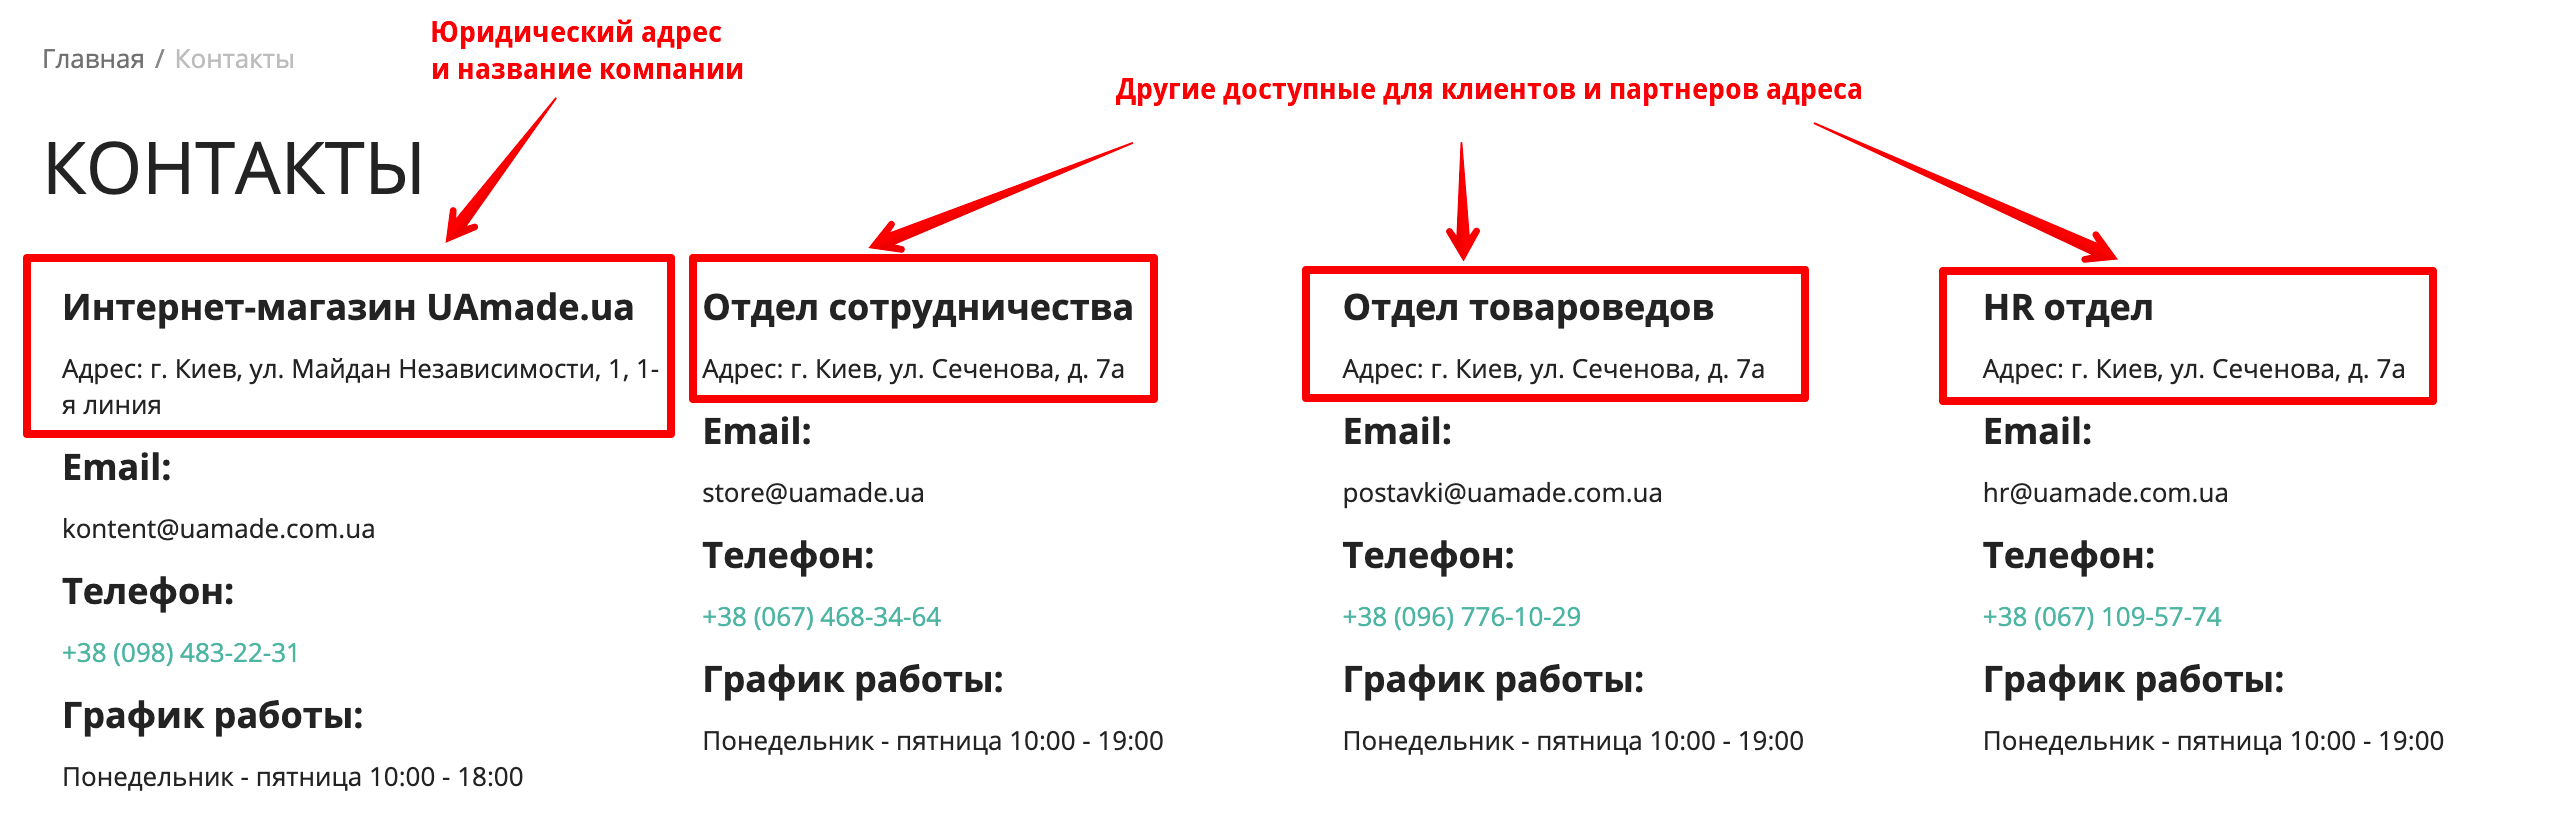 Страница «Контакты»